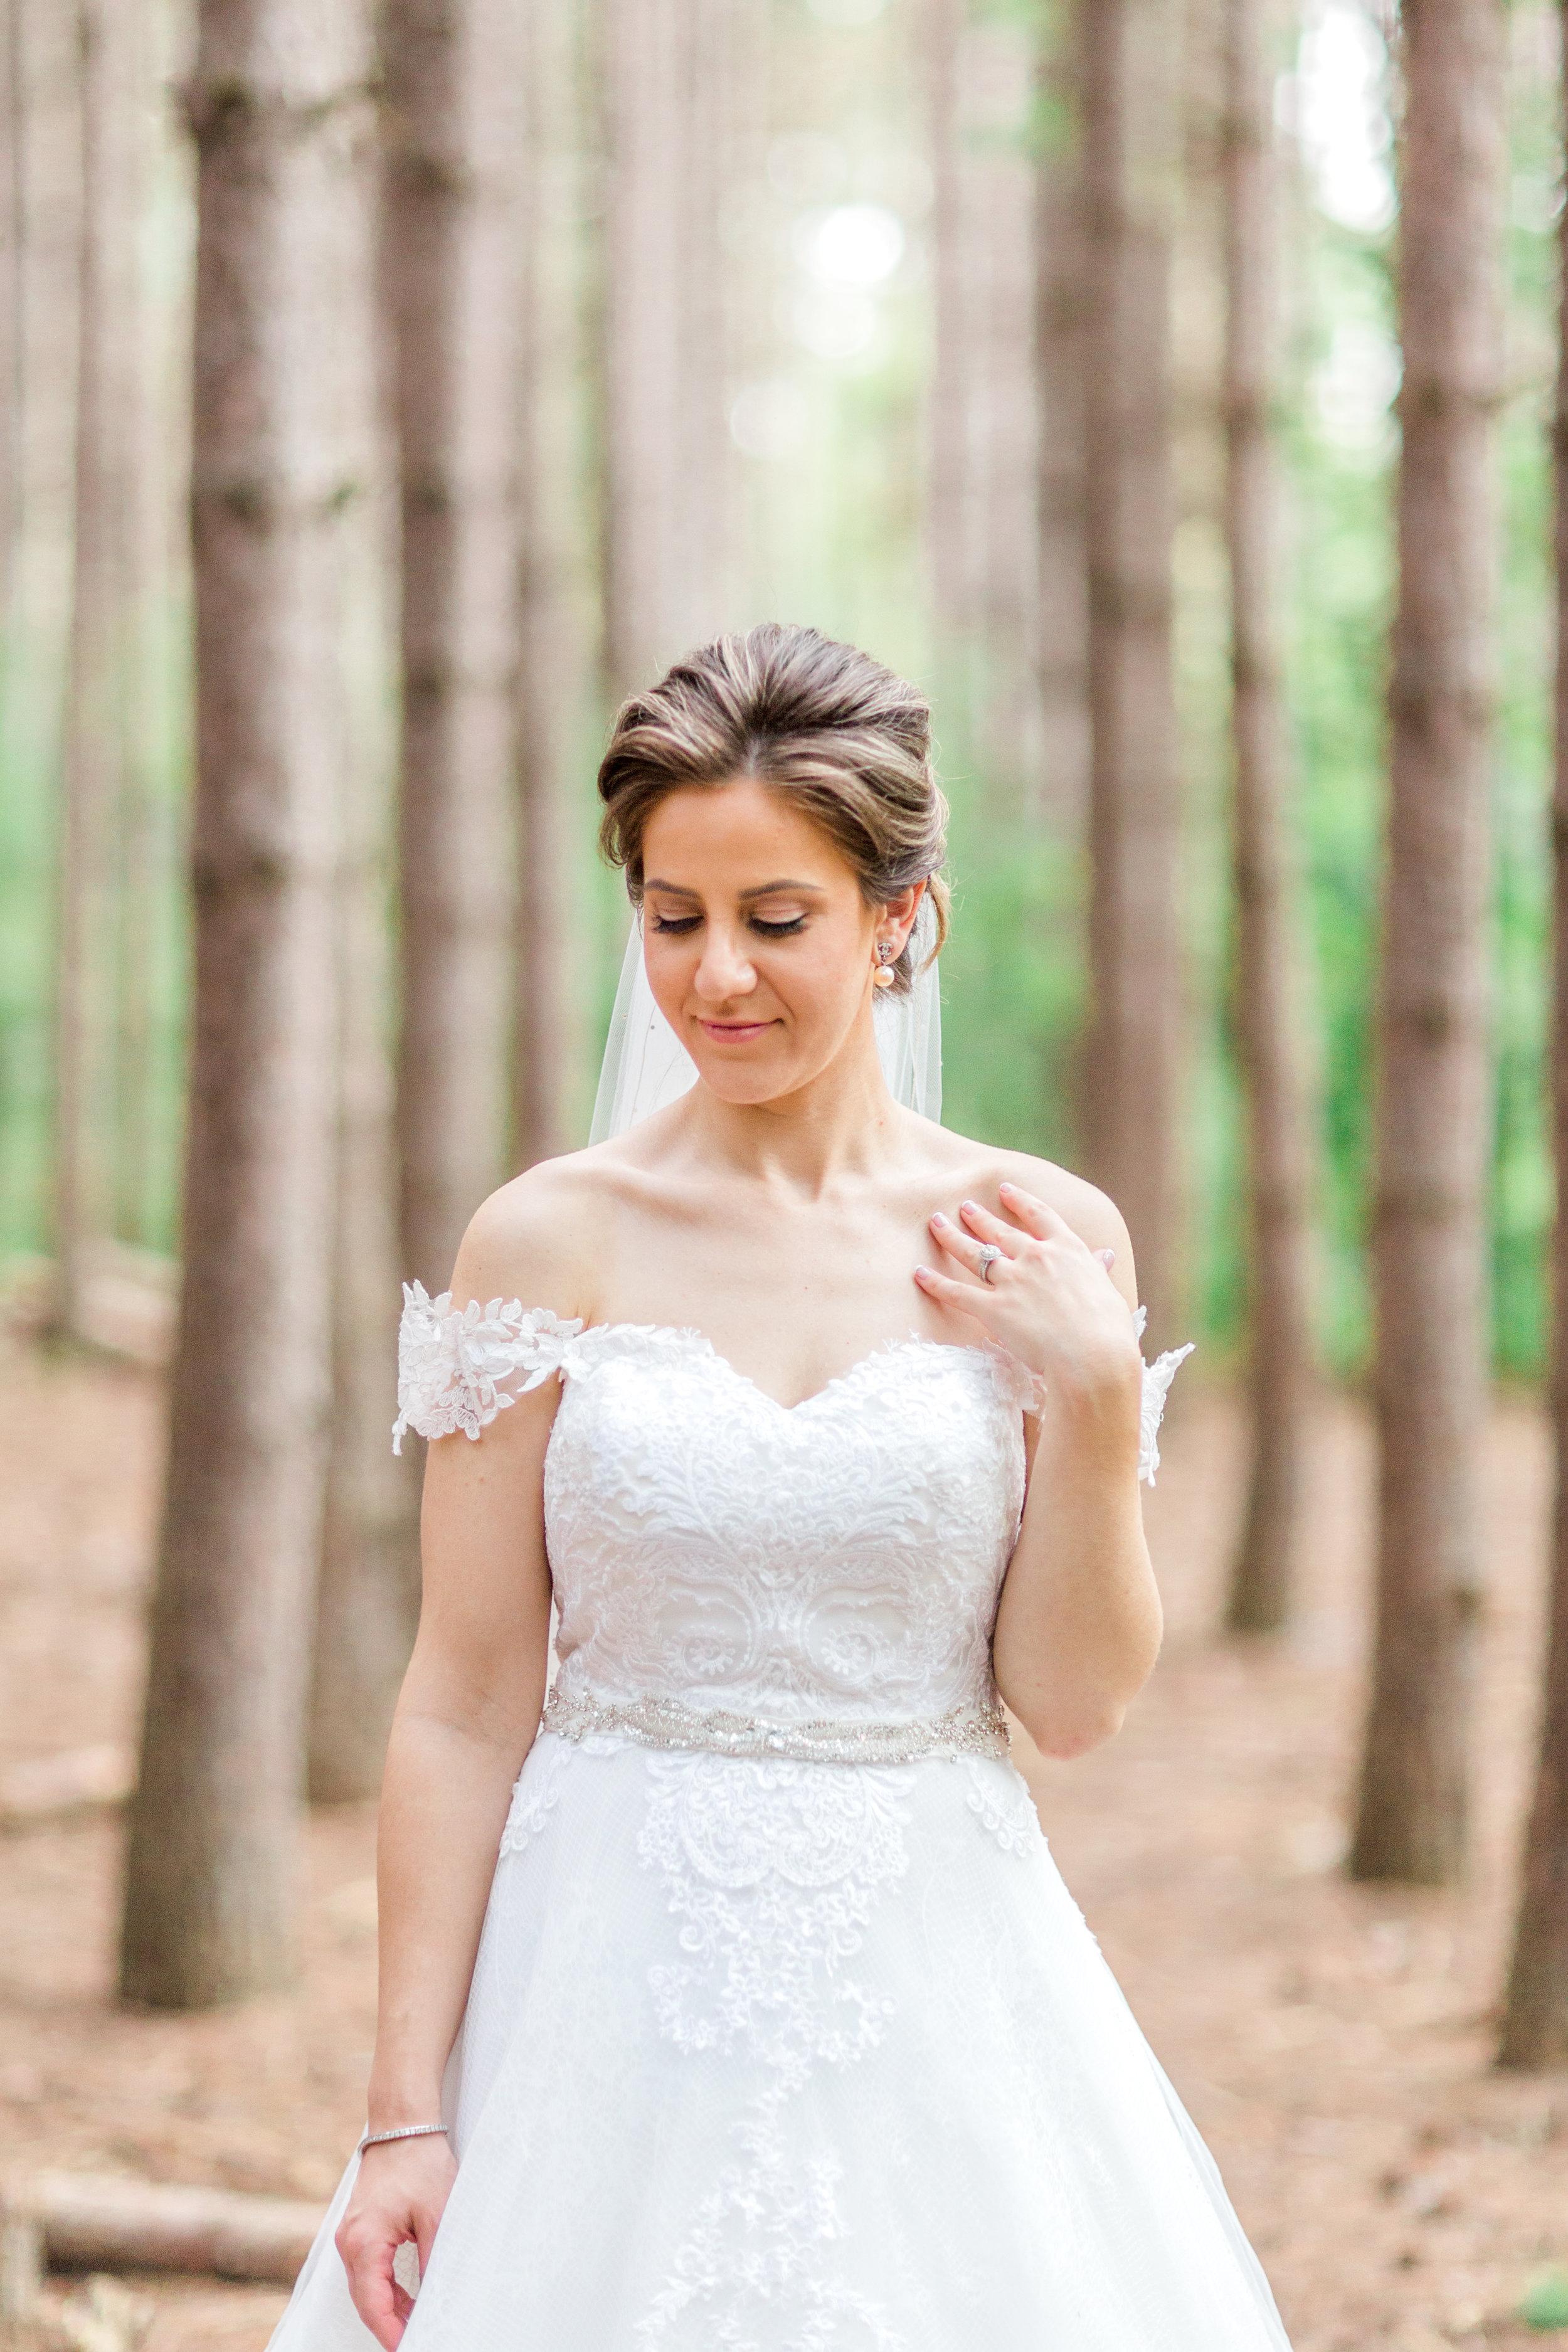 Danielle-Giroux-Amir-Golbazi-Toronto-Wedding-Photographer-Bellvue-Manor_DeLuca_1-747.jpg